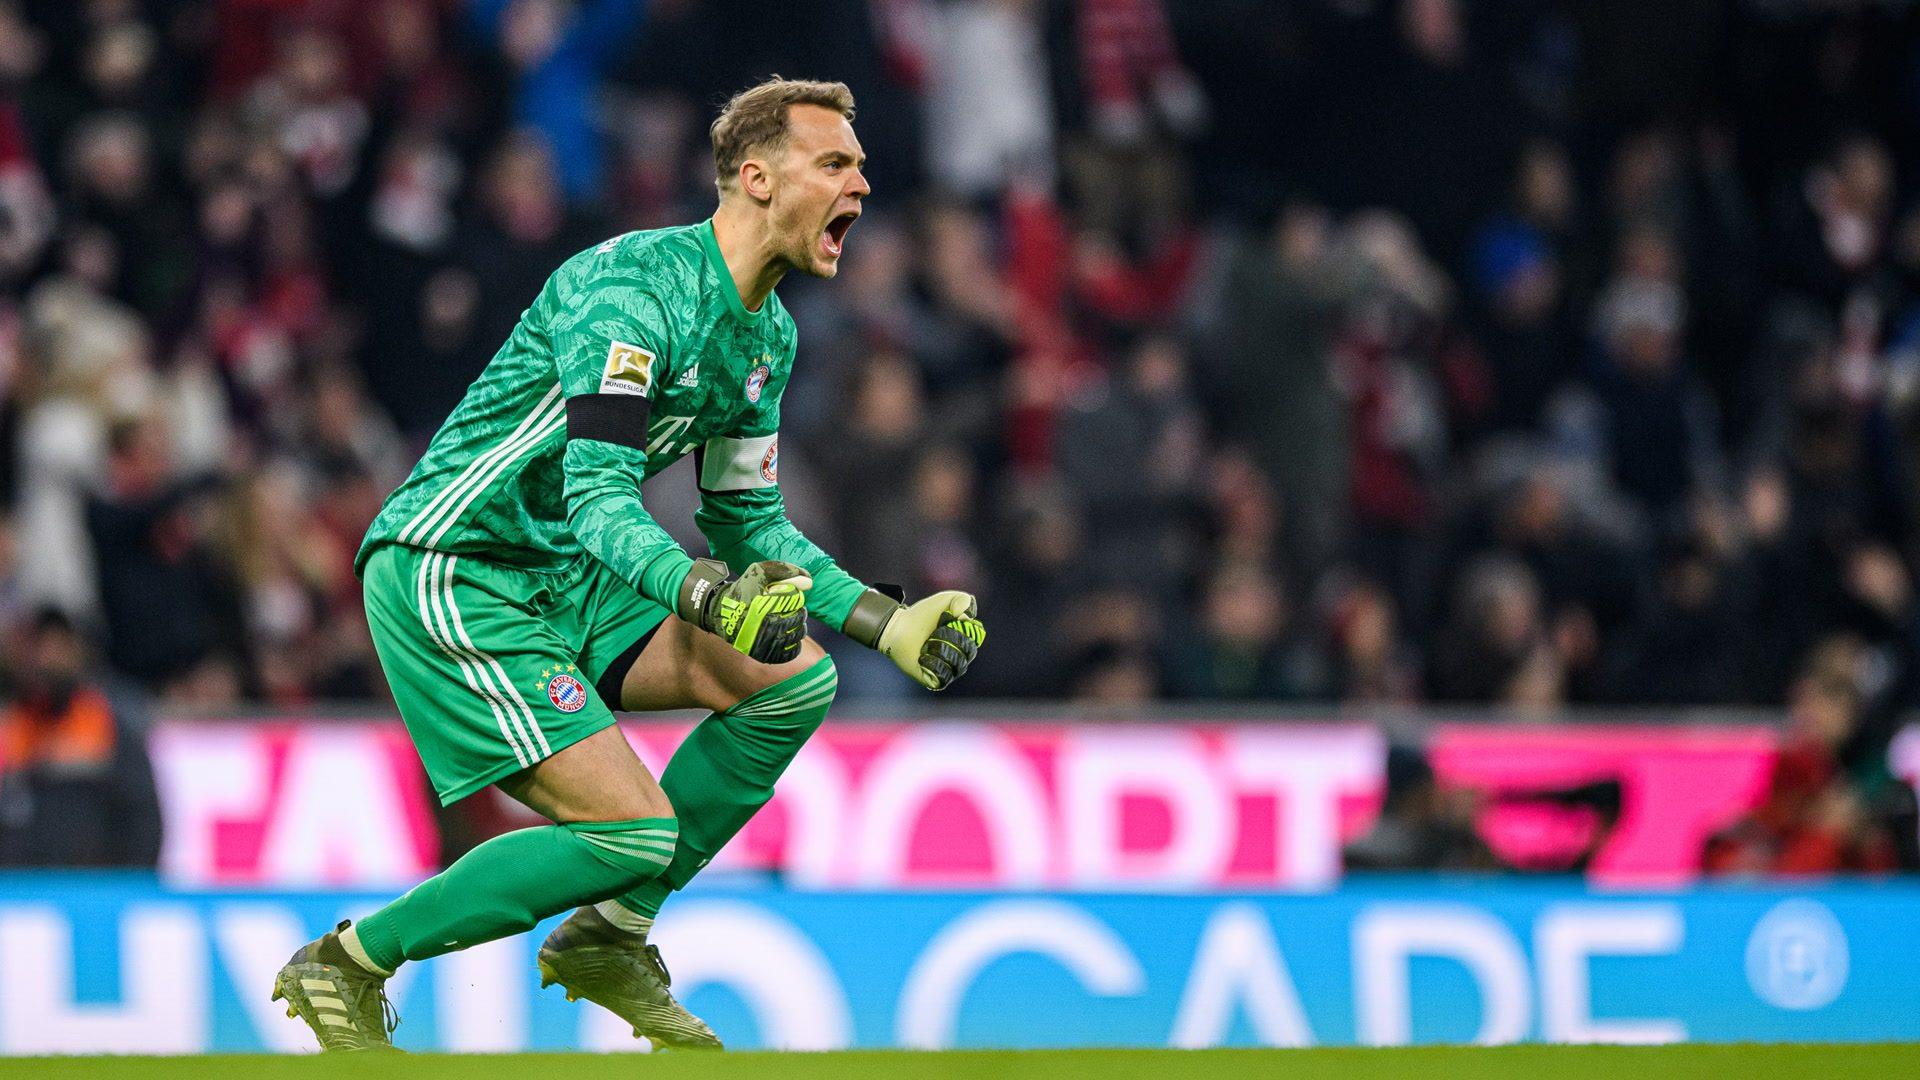 Bundesliga Manuel Neuer 10 Things On The Bayern Munich And Germany No 1